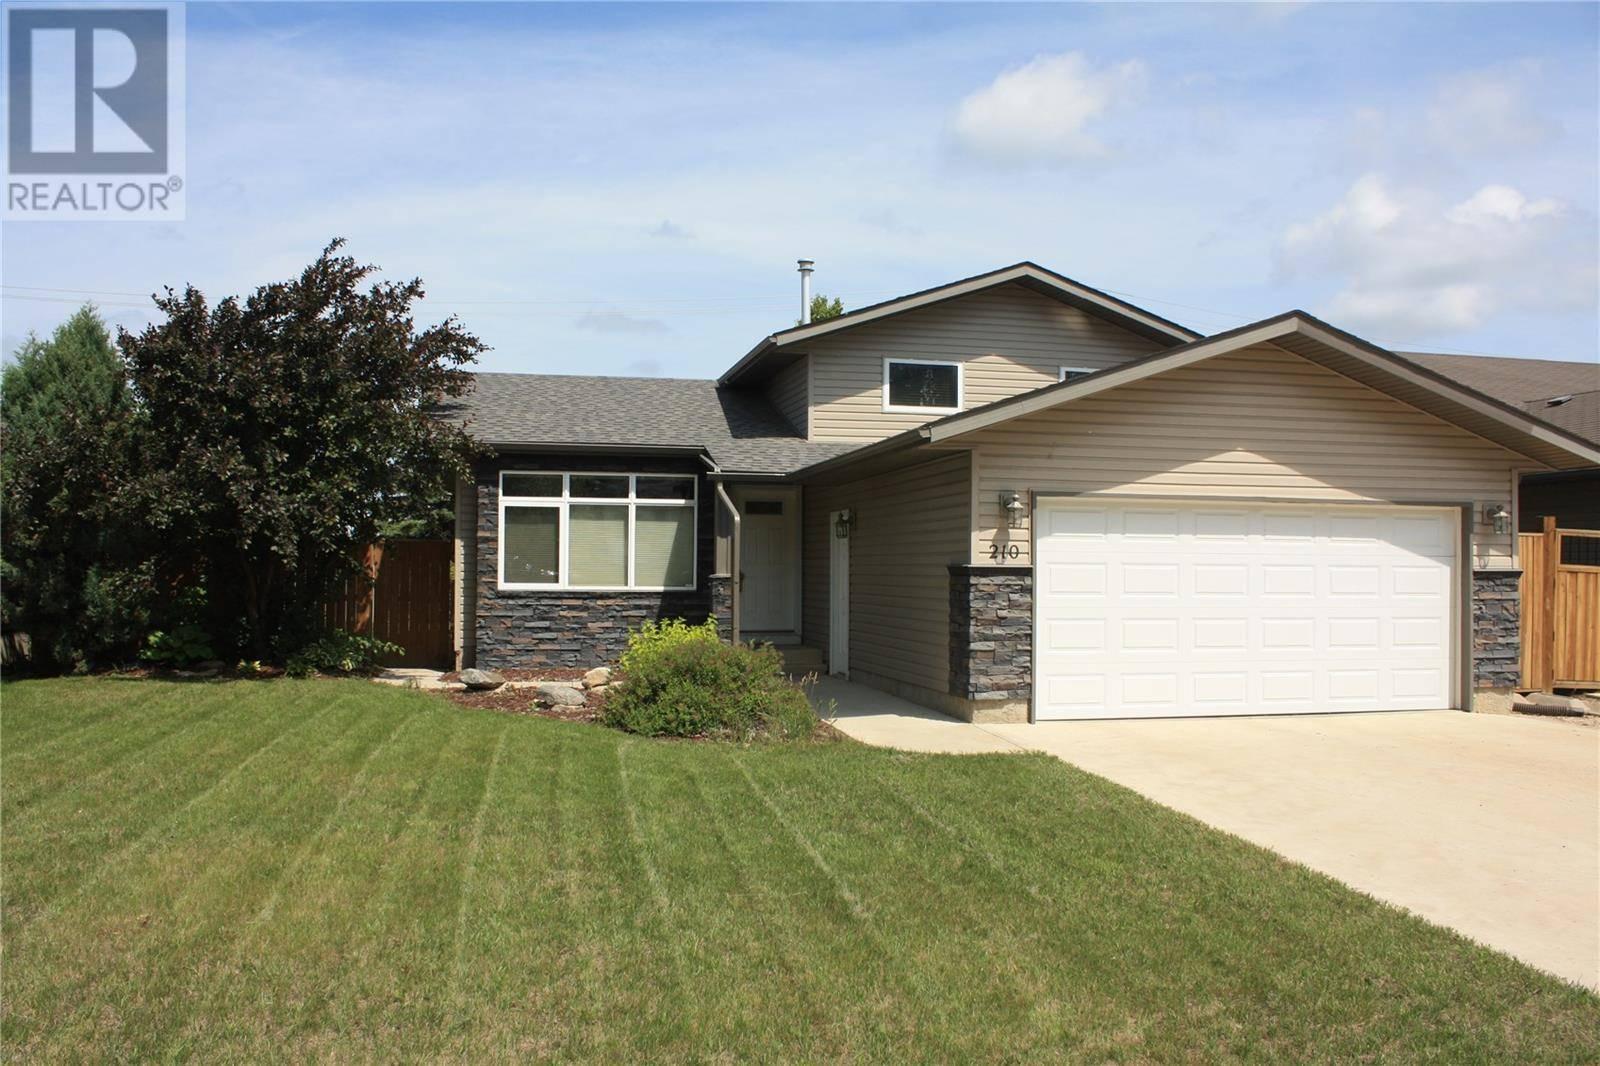 House for sale at 210 Victor Ter  Dalmeny Saskatchewan - MLS: SK767026